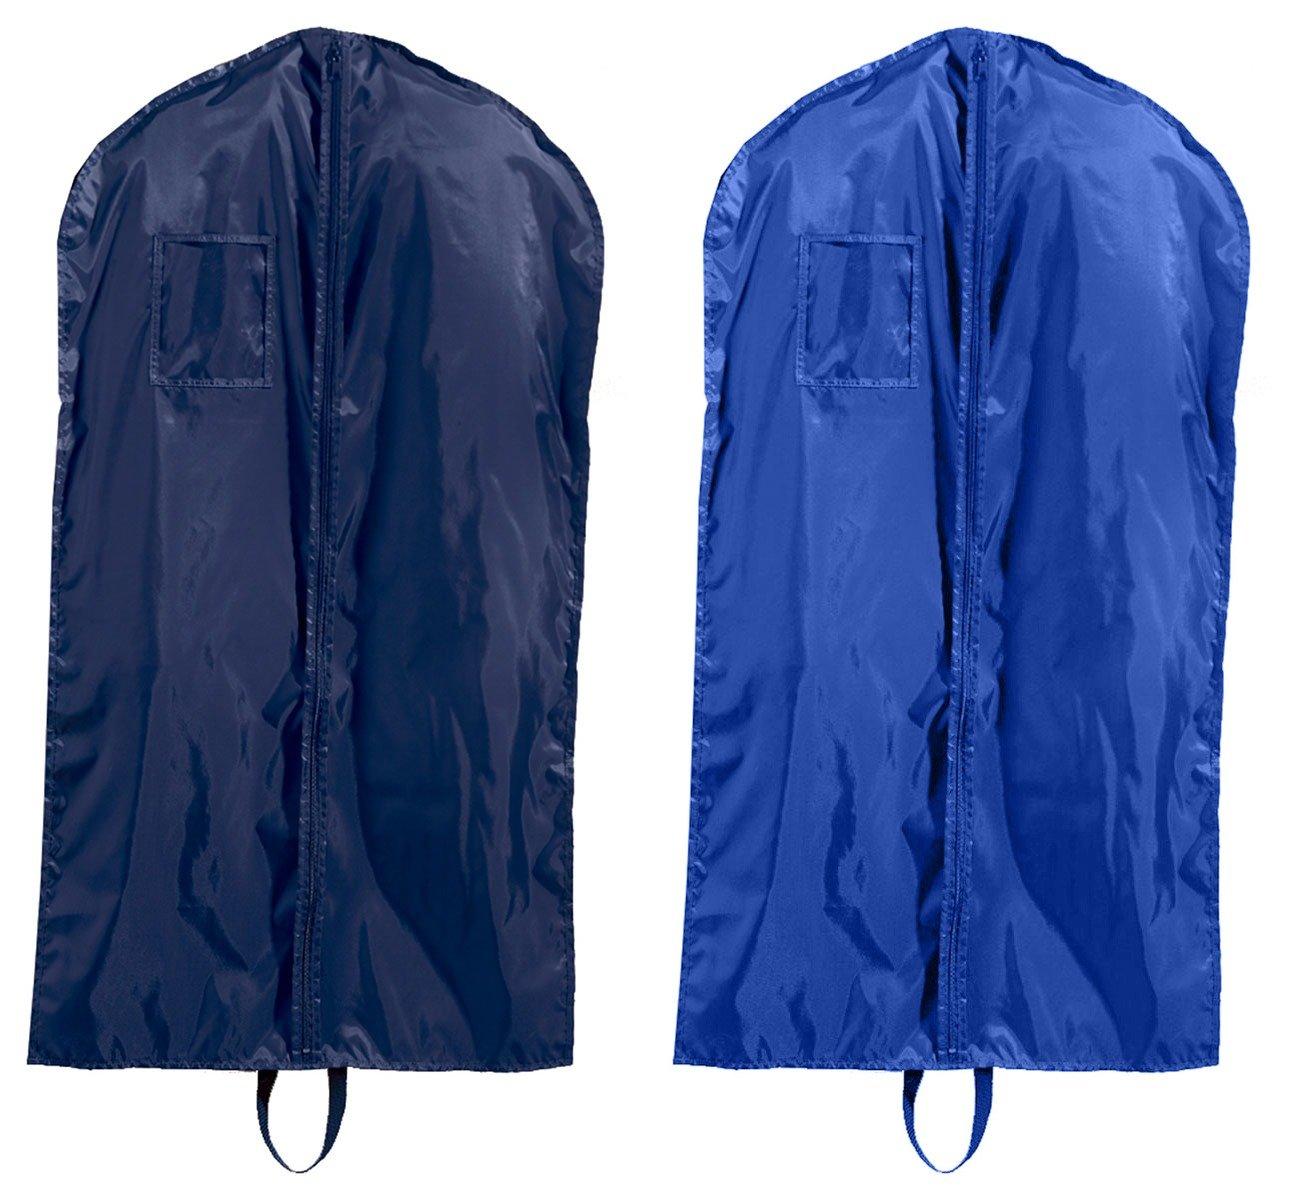 9009 -NAVY//ROYAL-OS Liberty Bags unisex-adult Garment Bag